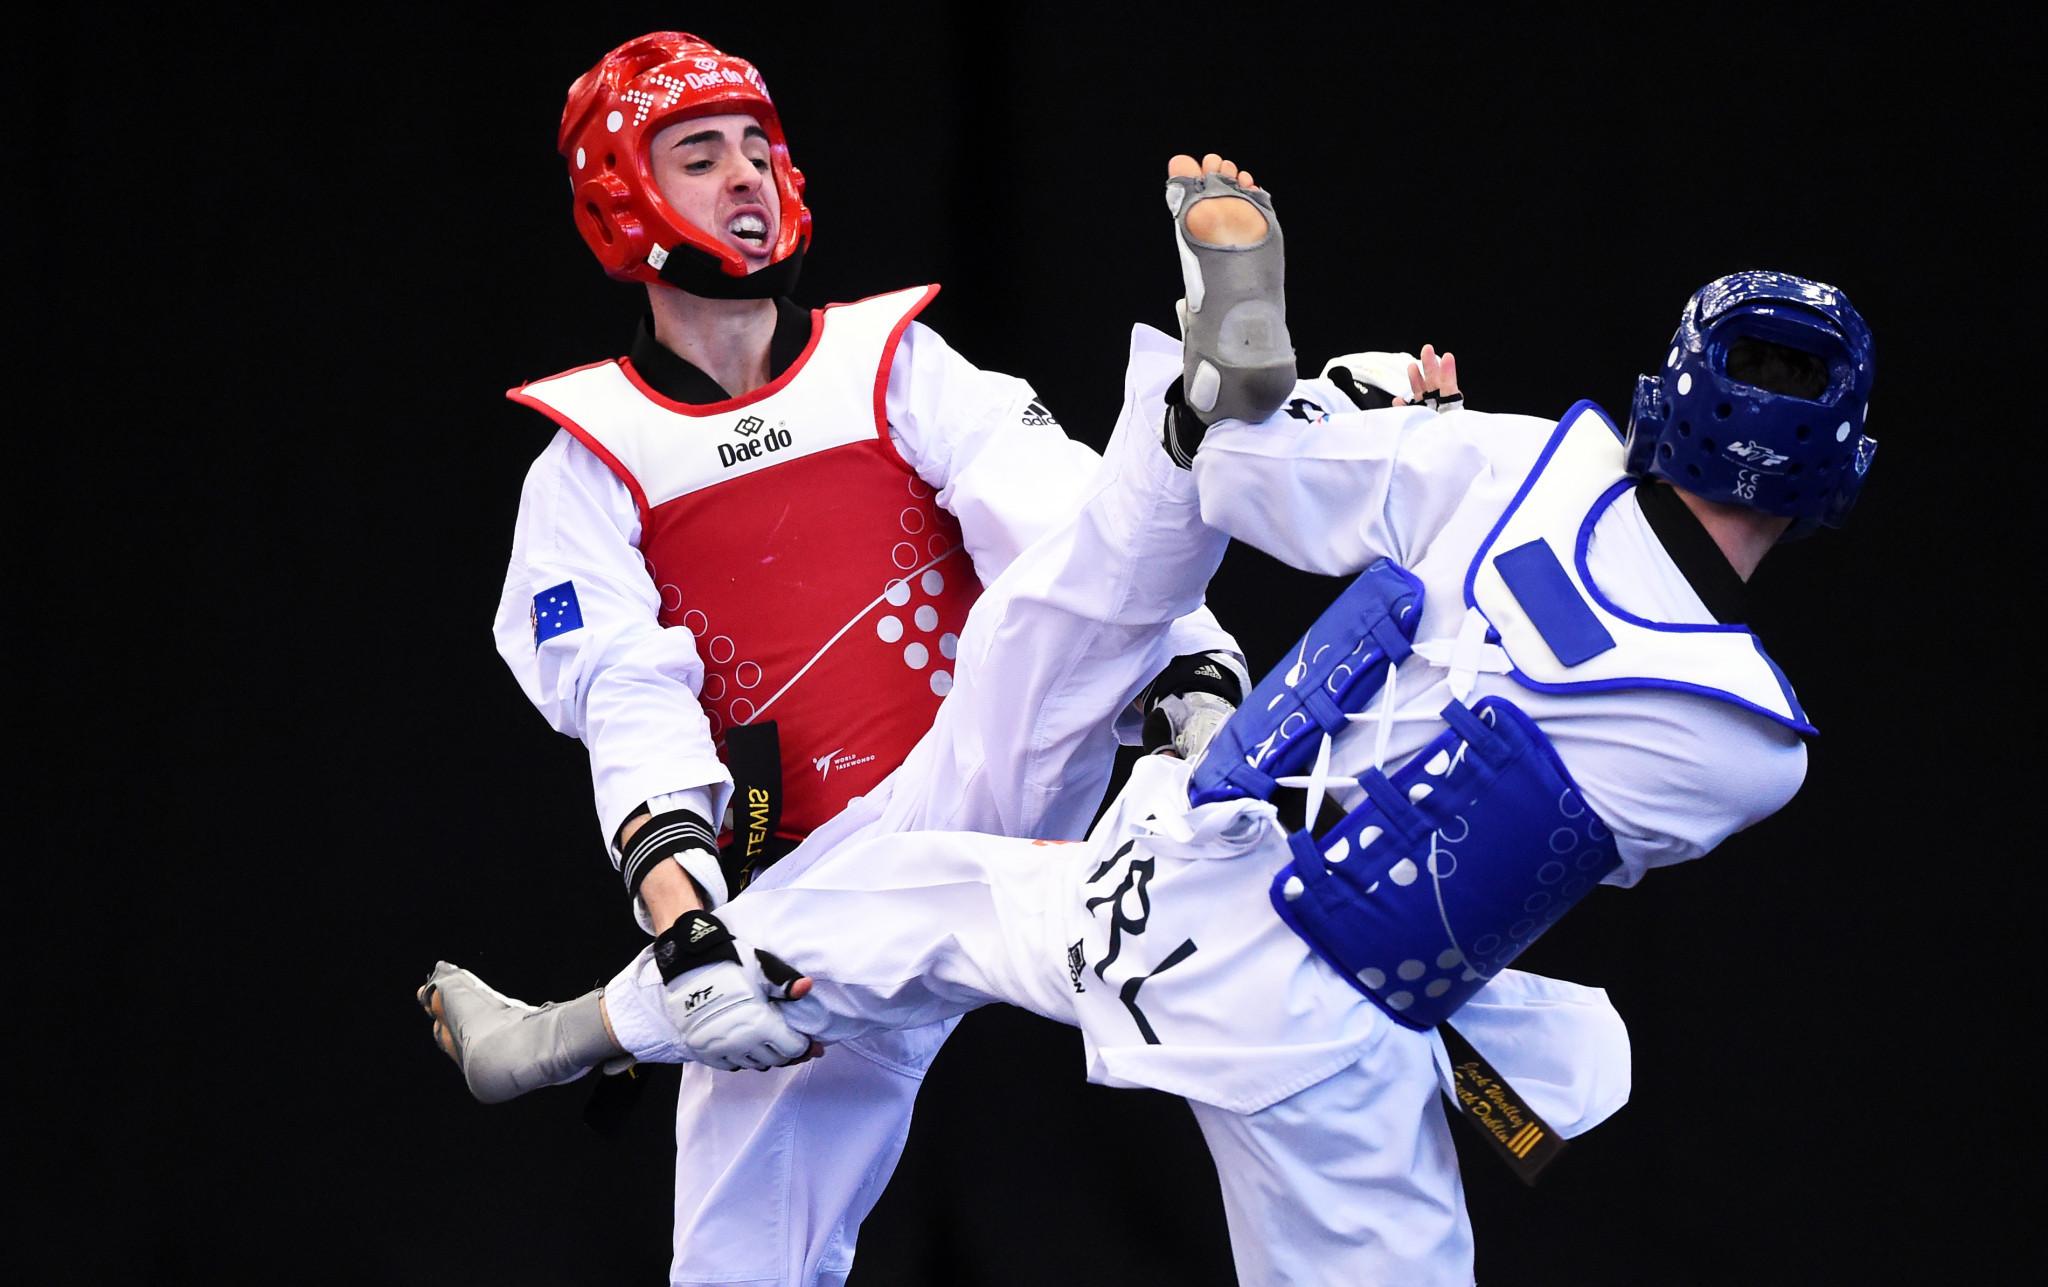 Bailey Lewis was part of Australian Taekwondo's scheme to inspire children ©Getty Images